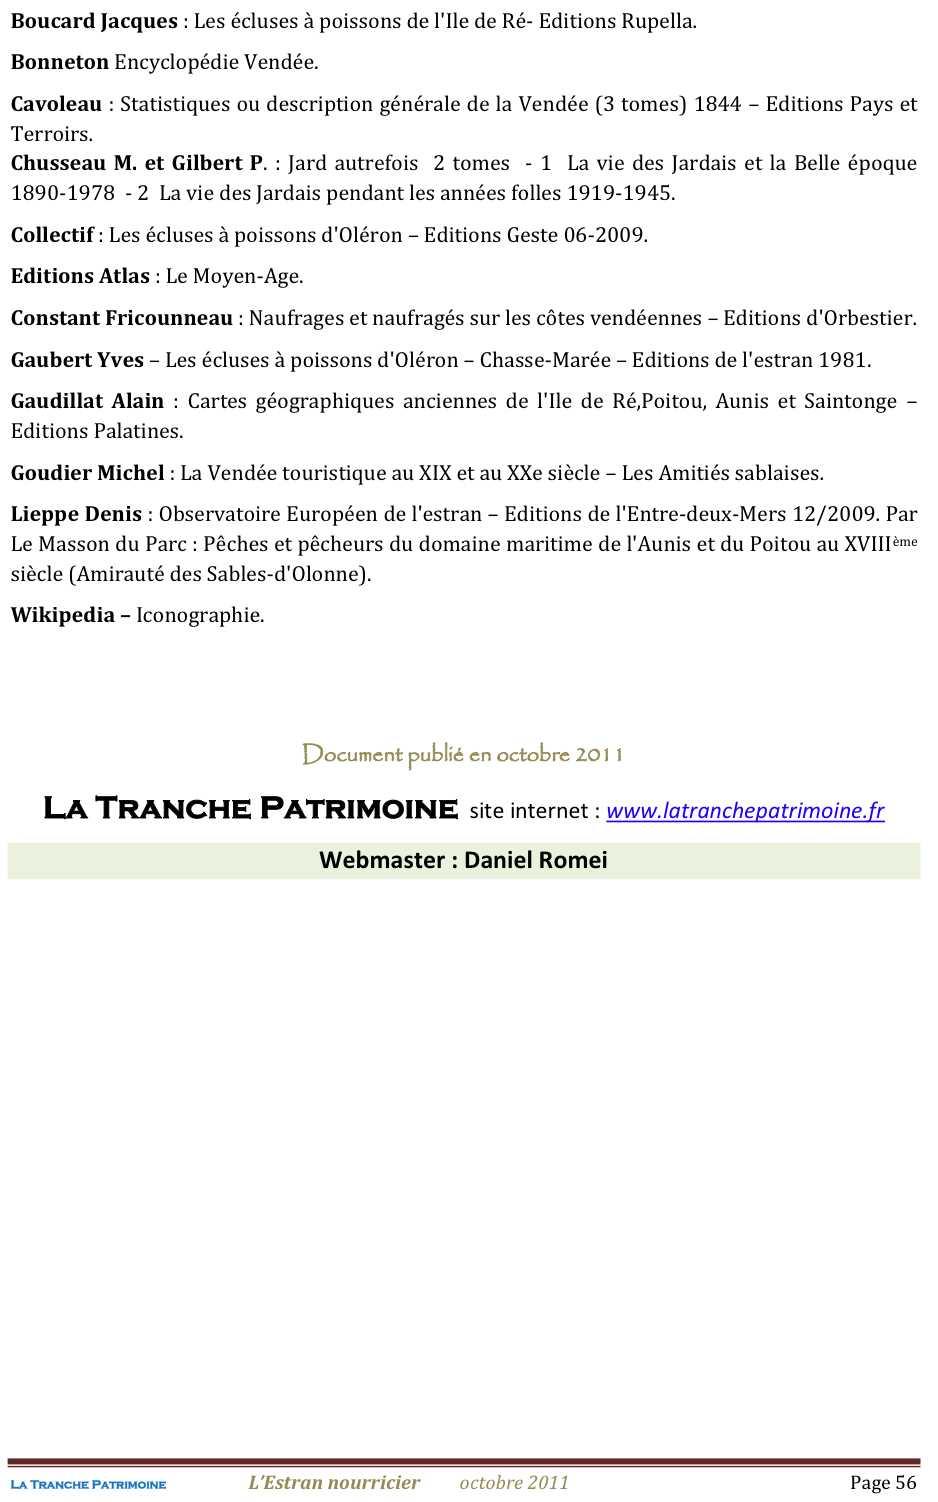 Lestran Nourricier 56 jpeg1.jpg